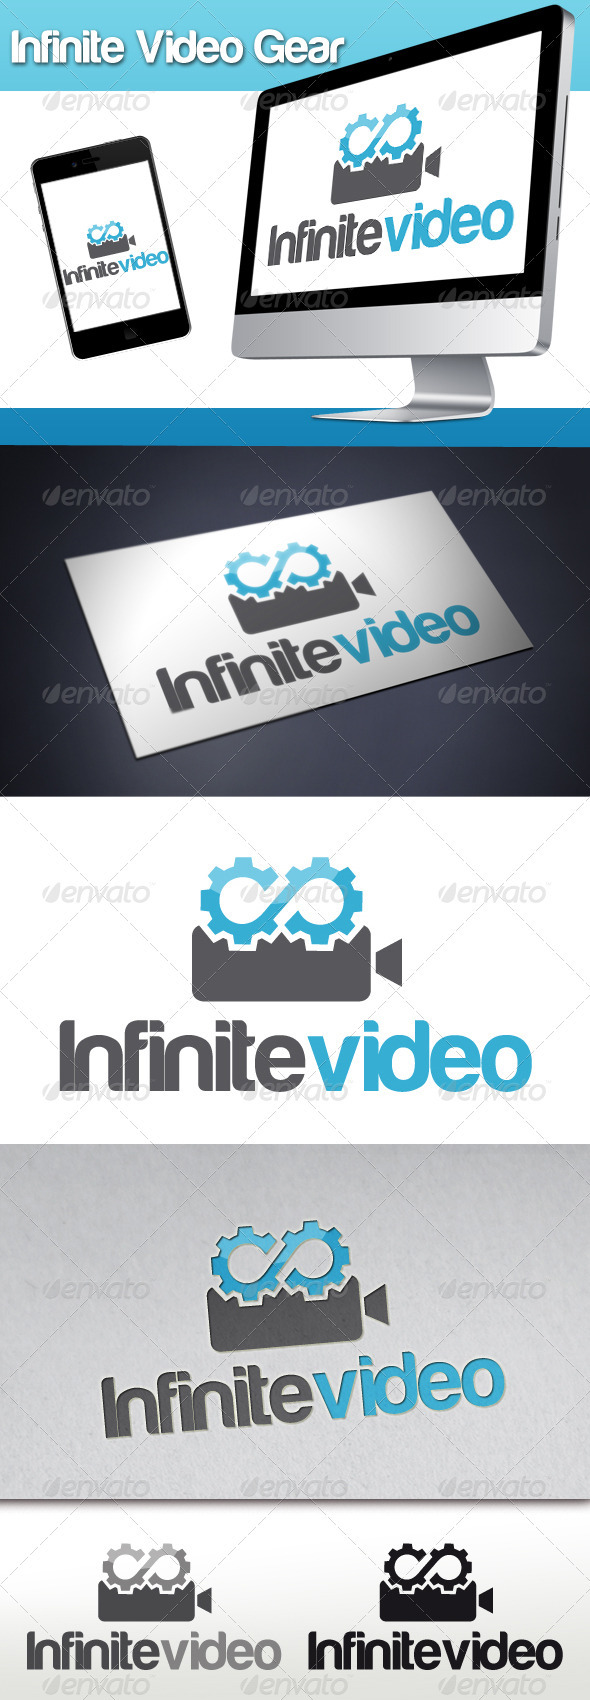 Infinite Video Gear Logo